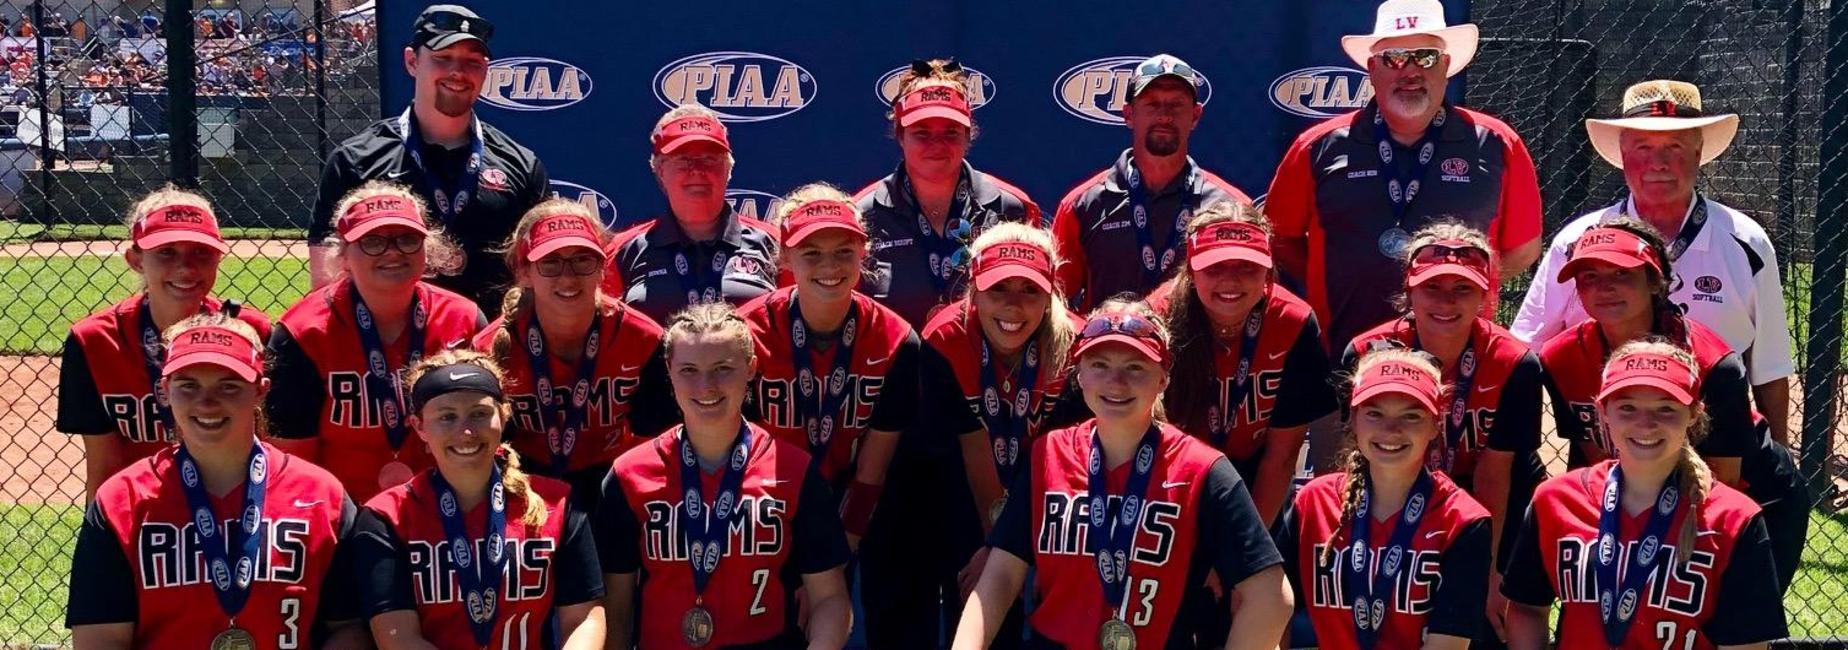 LVHS PIAA AA Softball Runner Up